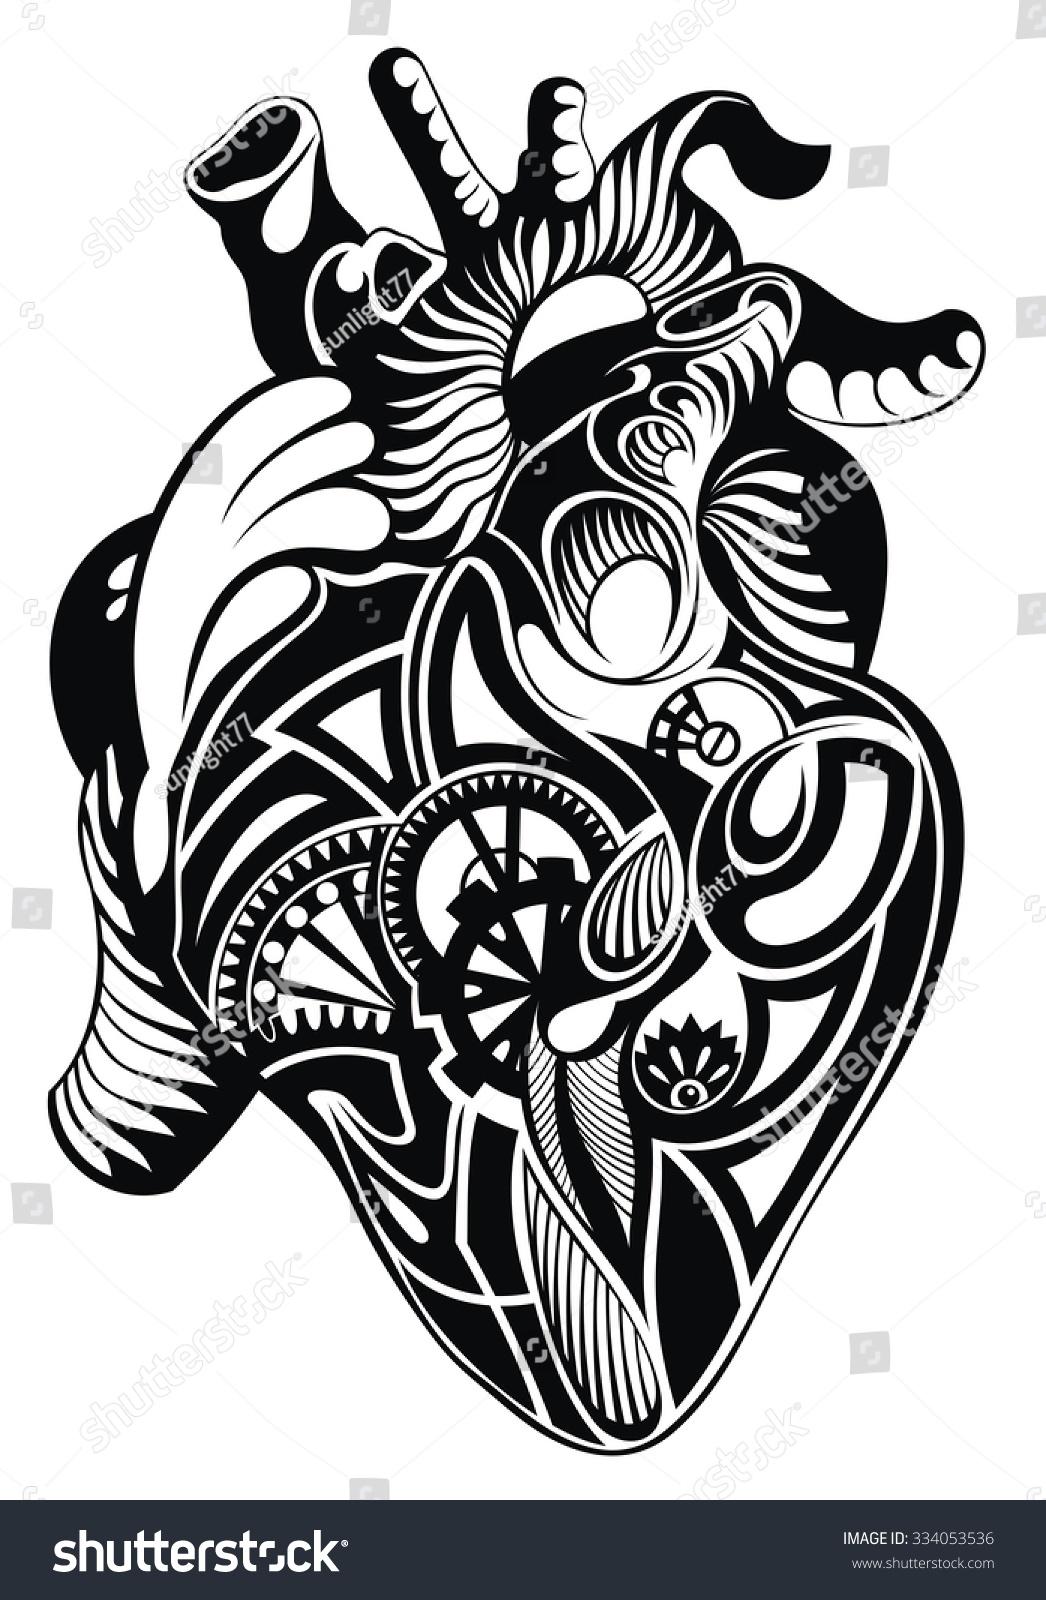 Human Heart Vector Heart Illustration Tattoo Stock Vector ...